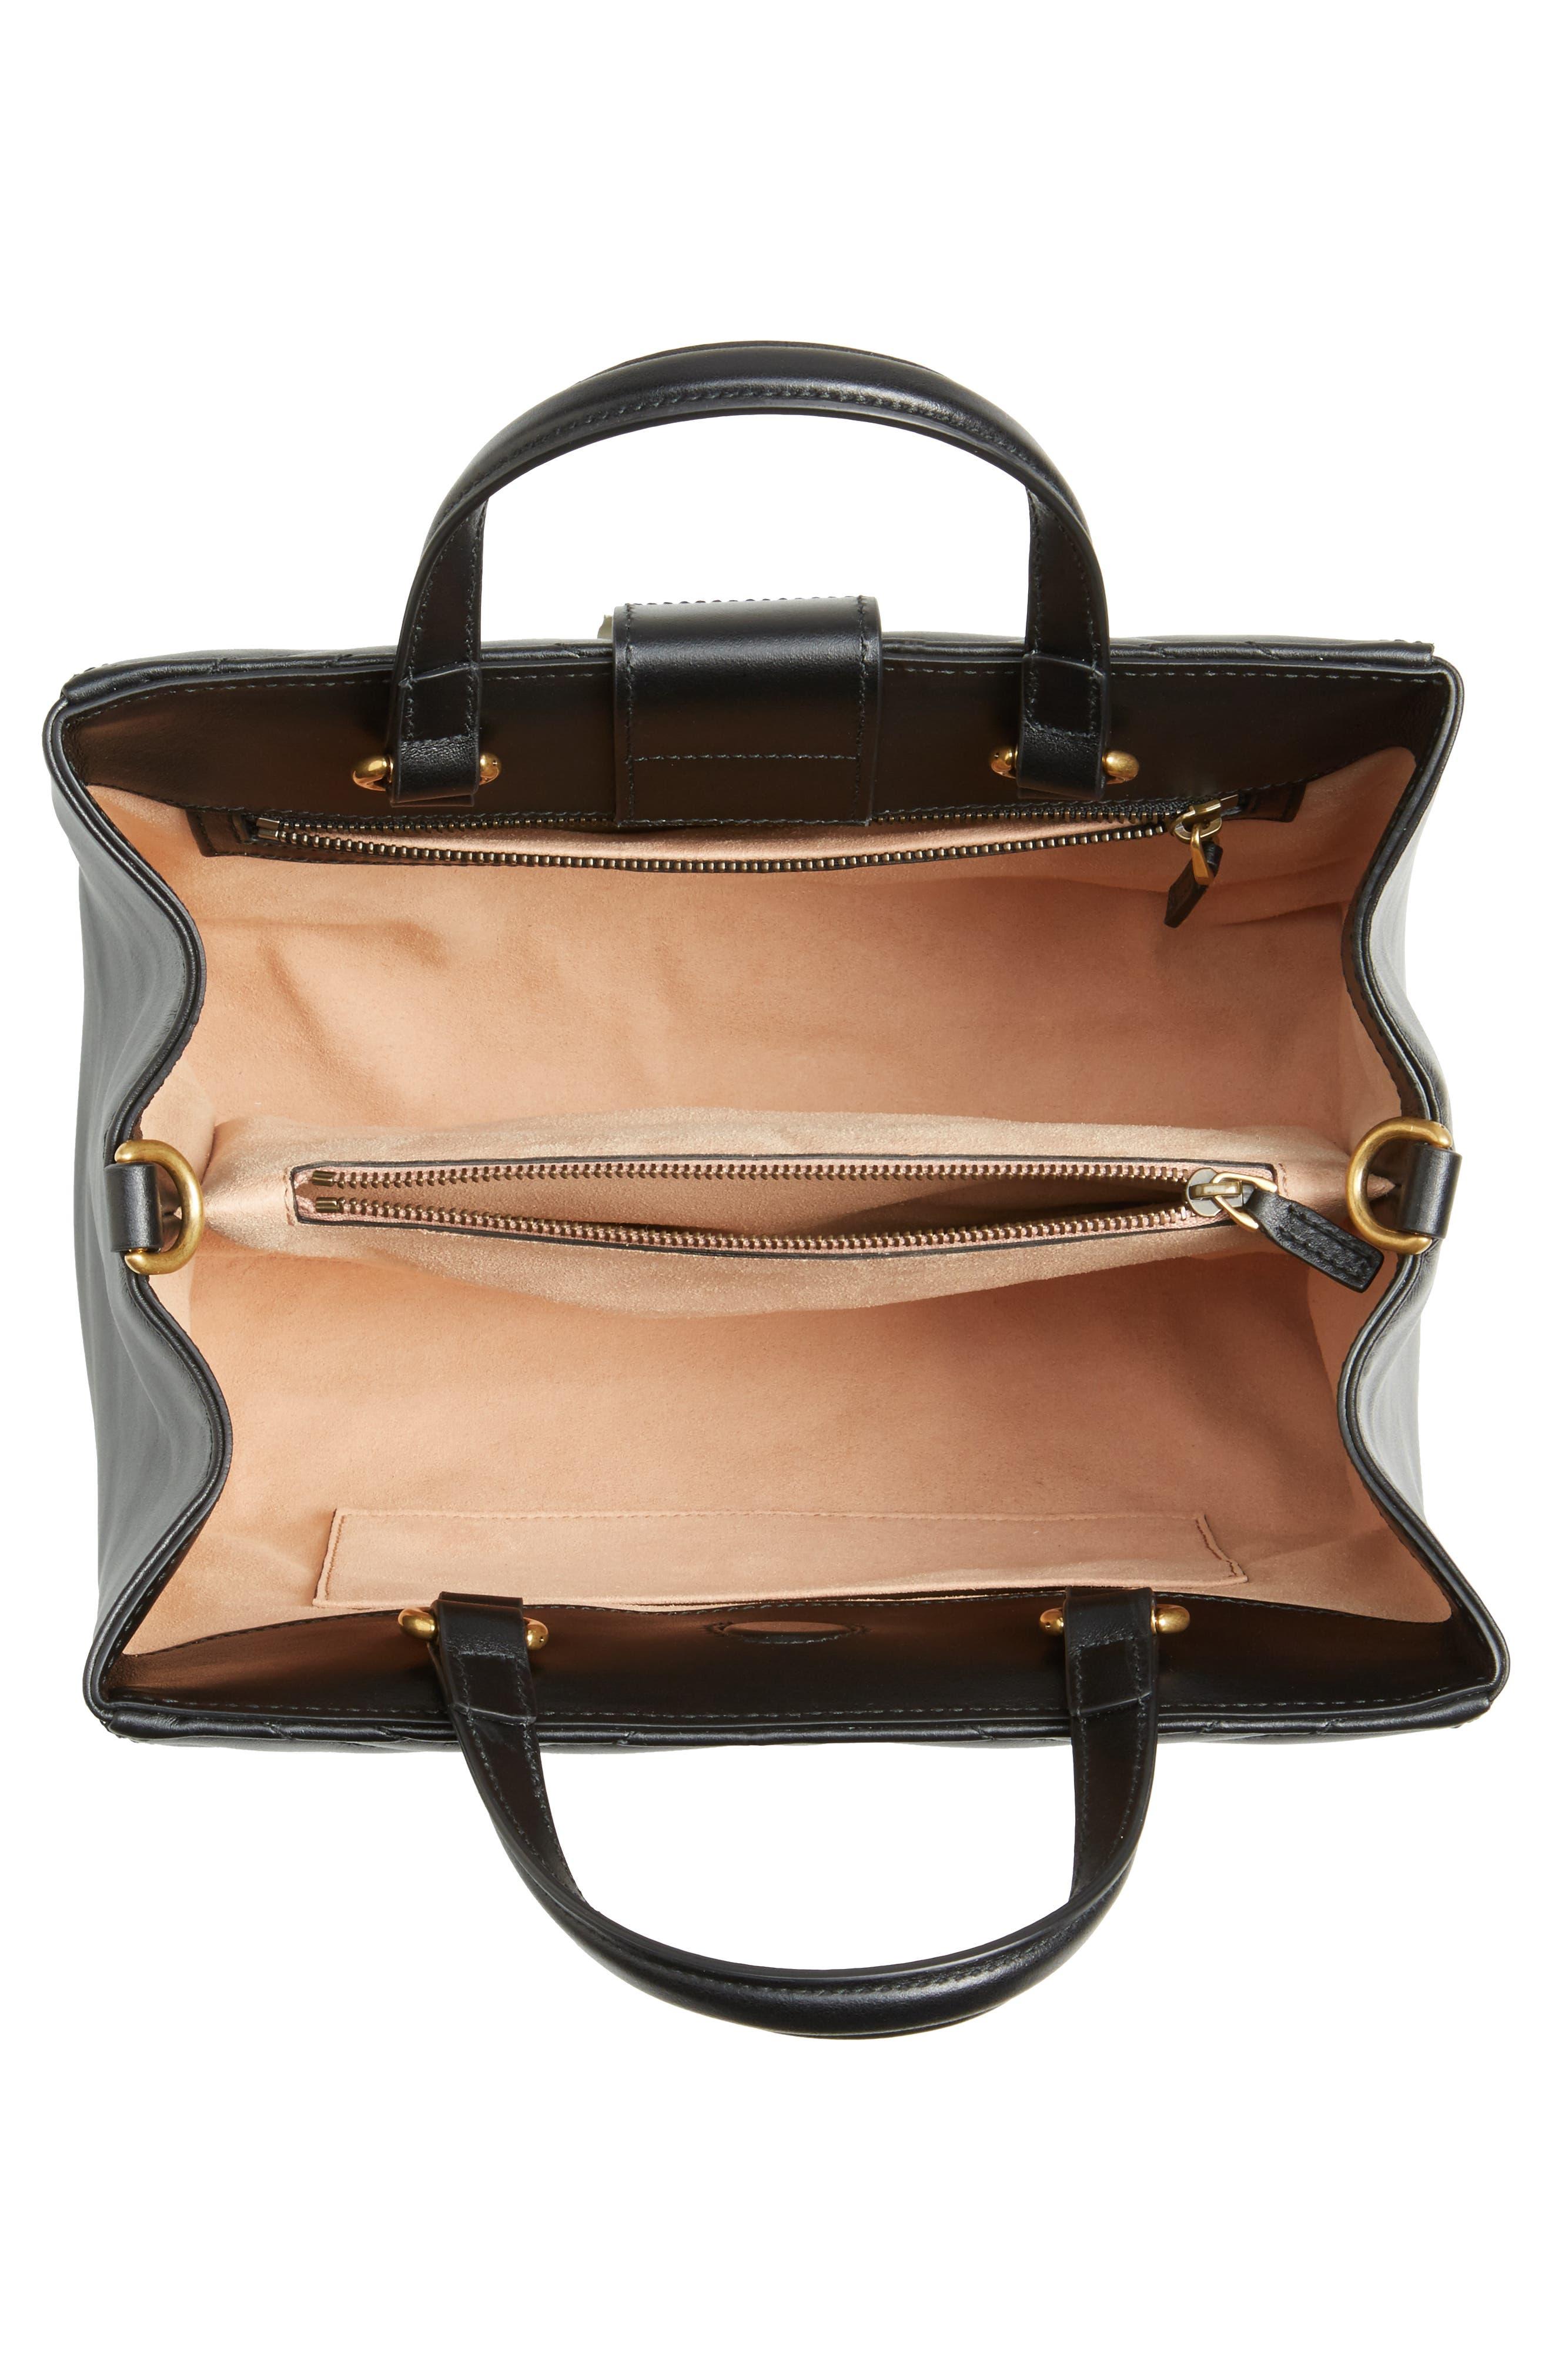 GG Small Marmont 2.0 Matelassé Leather Top Handle Satchel,                             Alternate thumbnail 4, color,                             NERO/ NERO